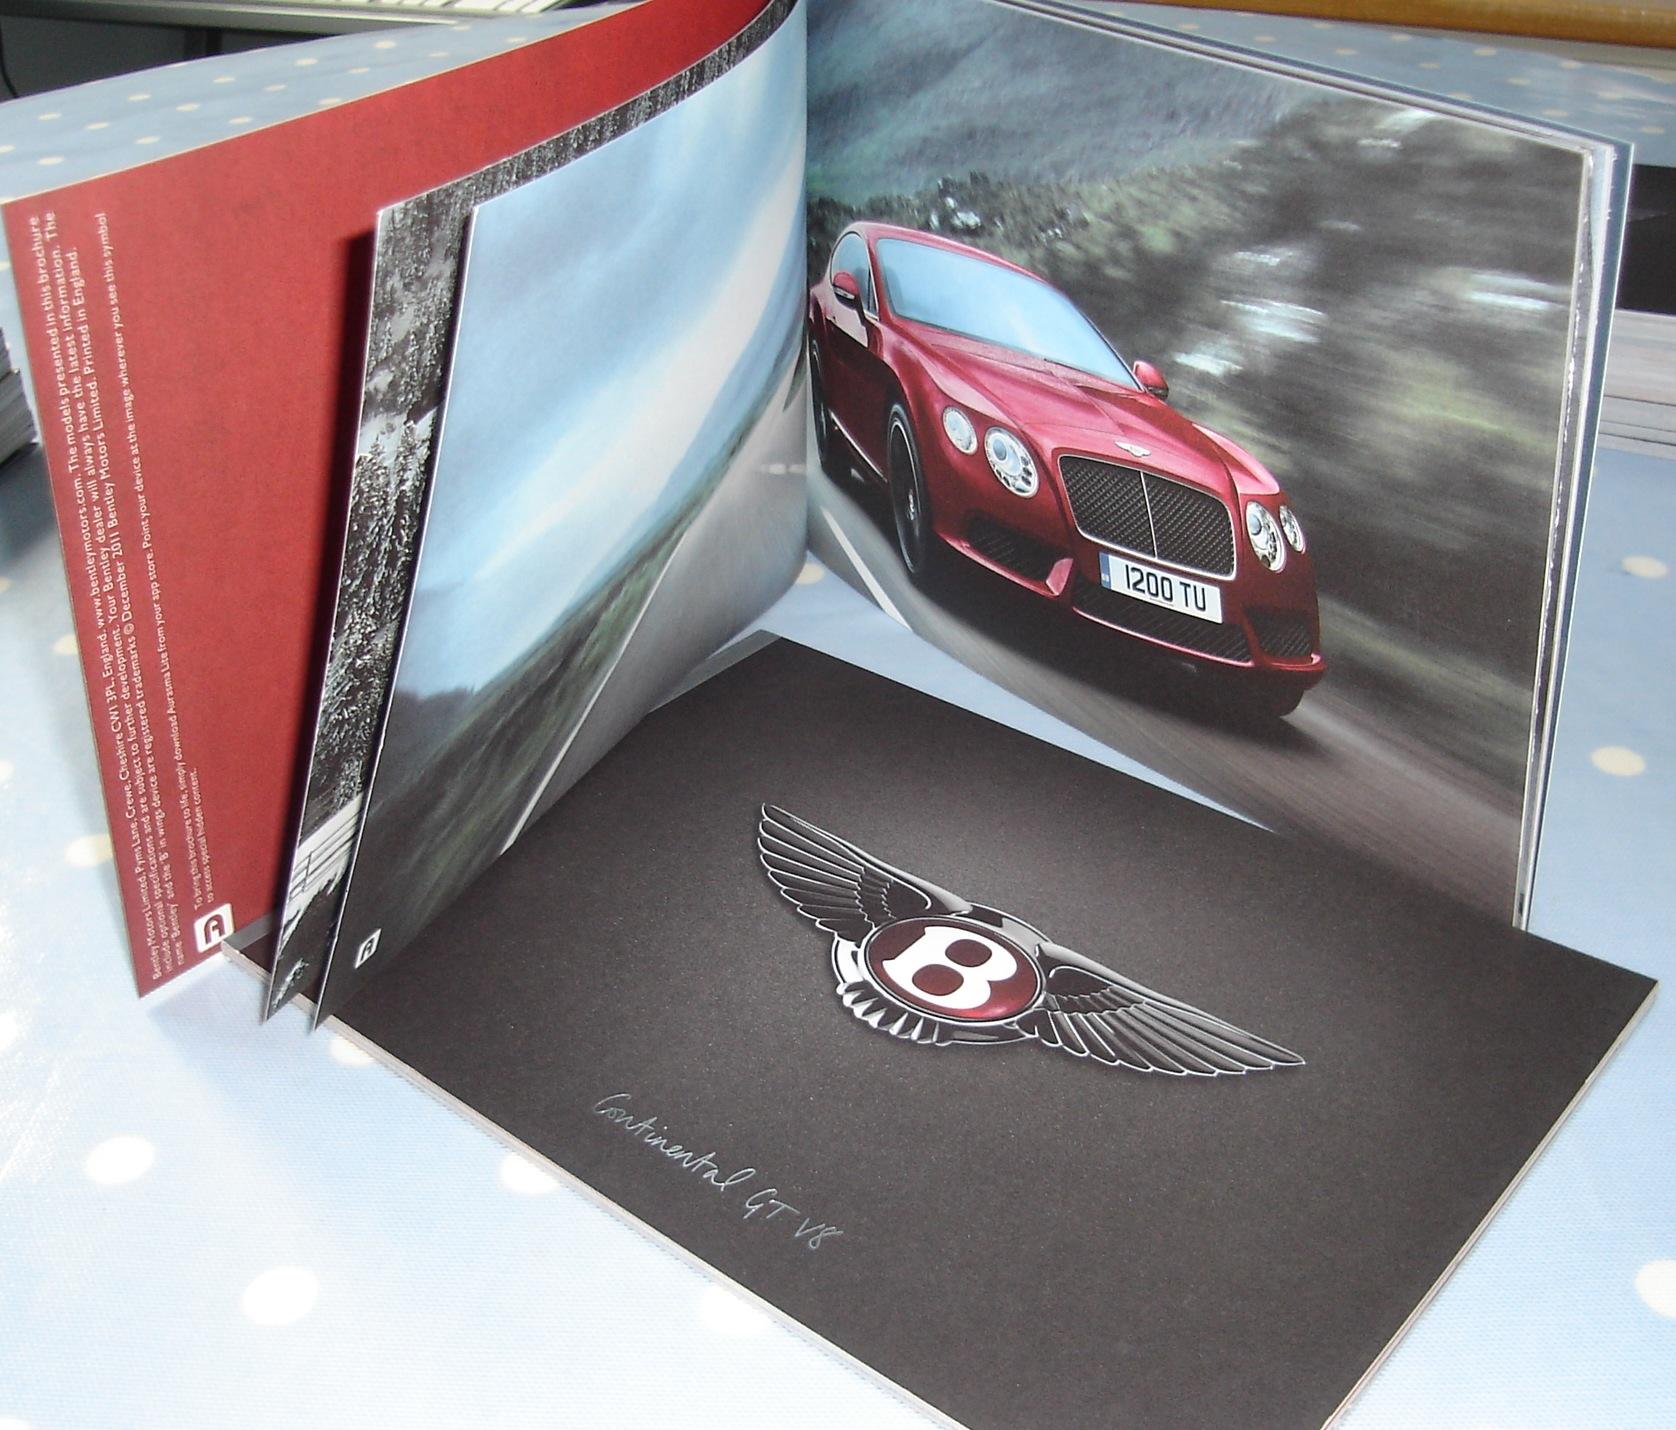 BENTLEY GTV8 And GTCV8 Catalogue Brochure A5 Sized